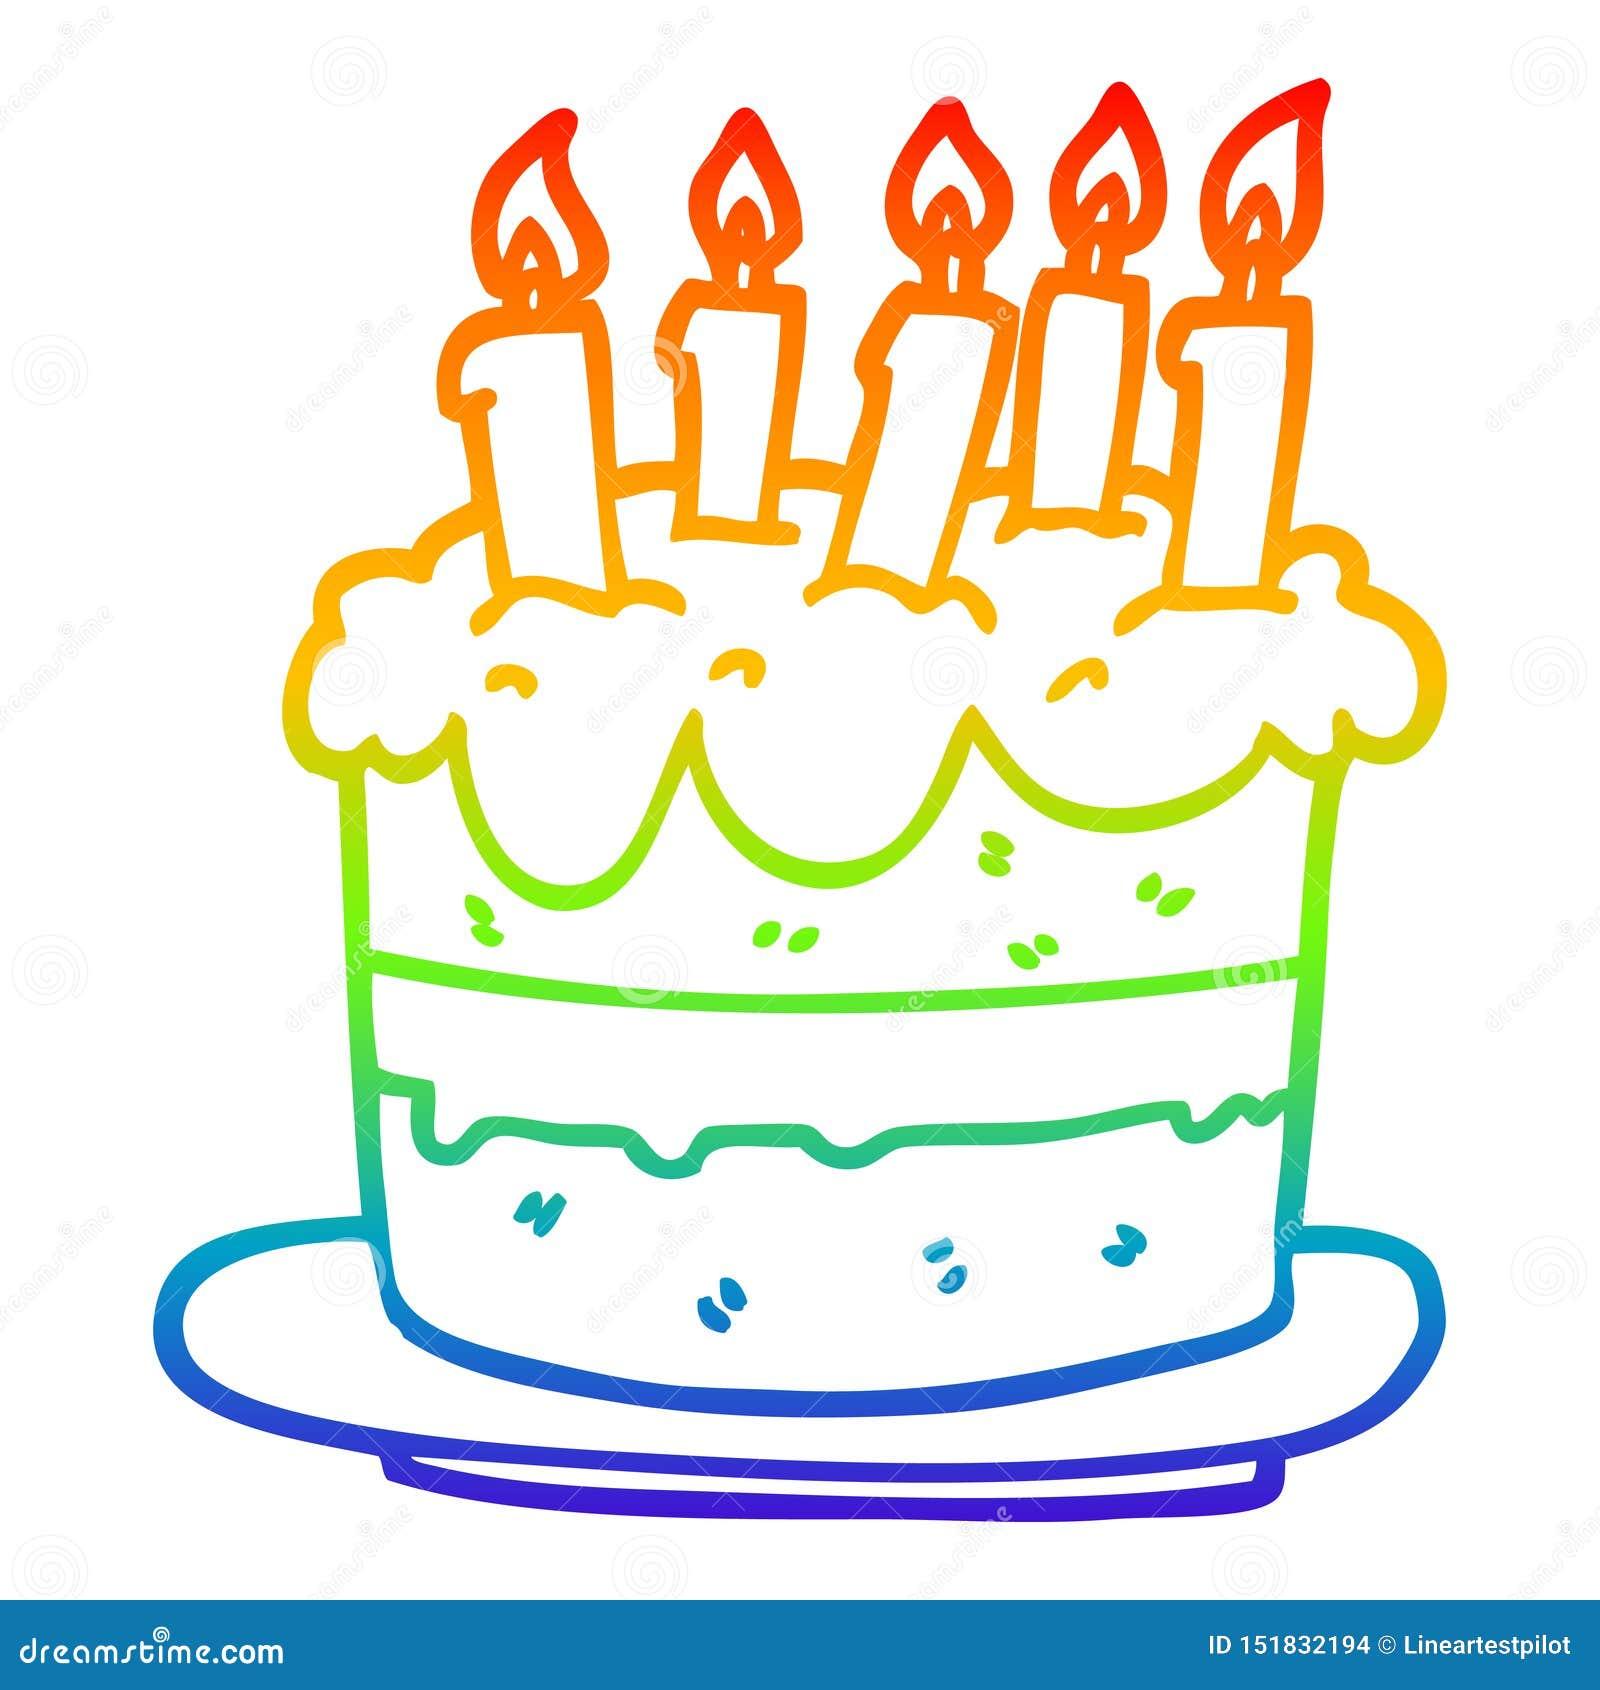 Marvelous A Creative Rainbow Gradient Line Drawing Cartoon Birthday Cake Funny Birthday Cards Online Kookostrdamsfinfo